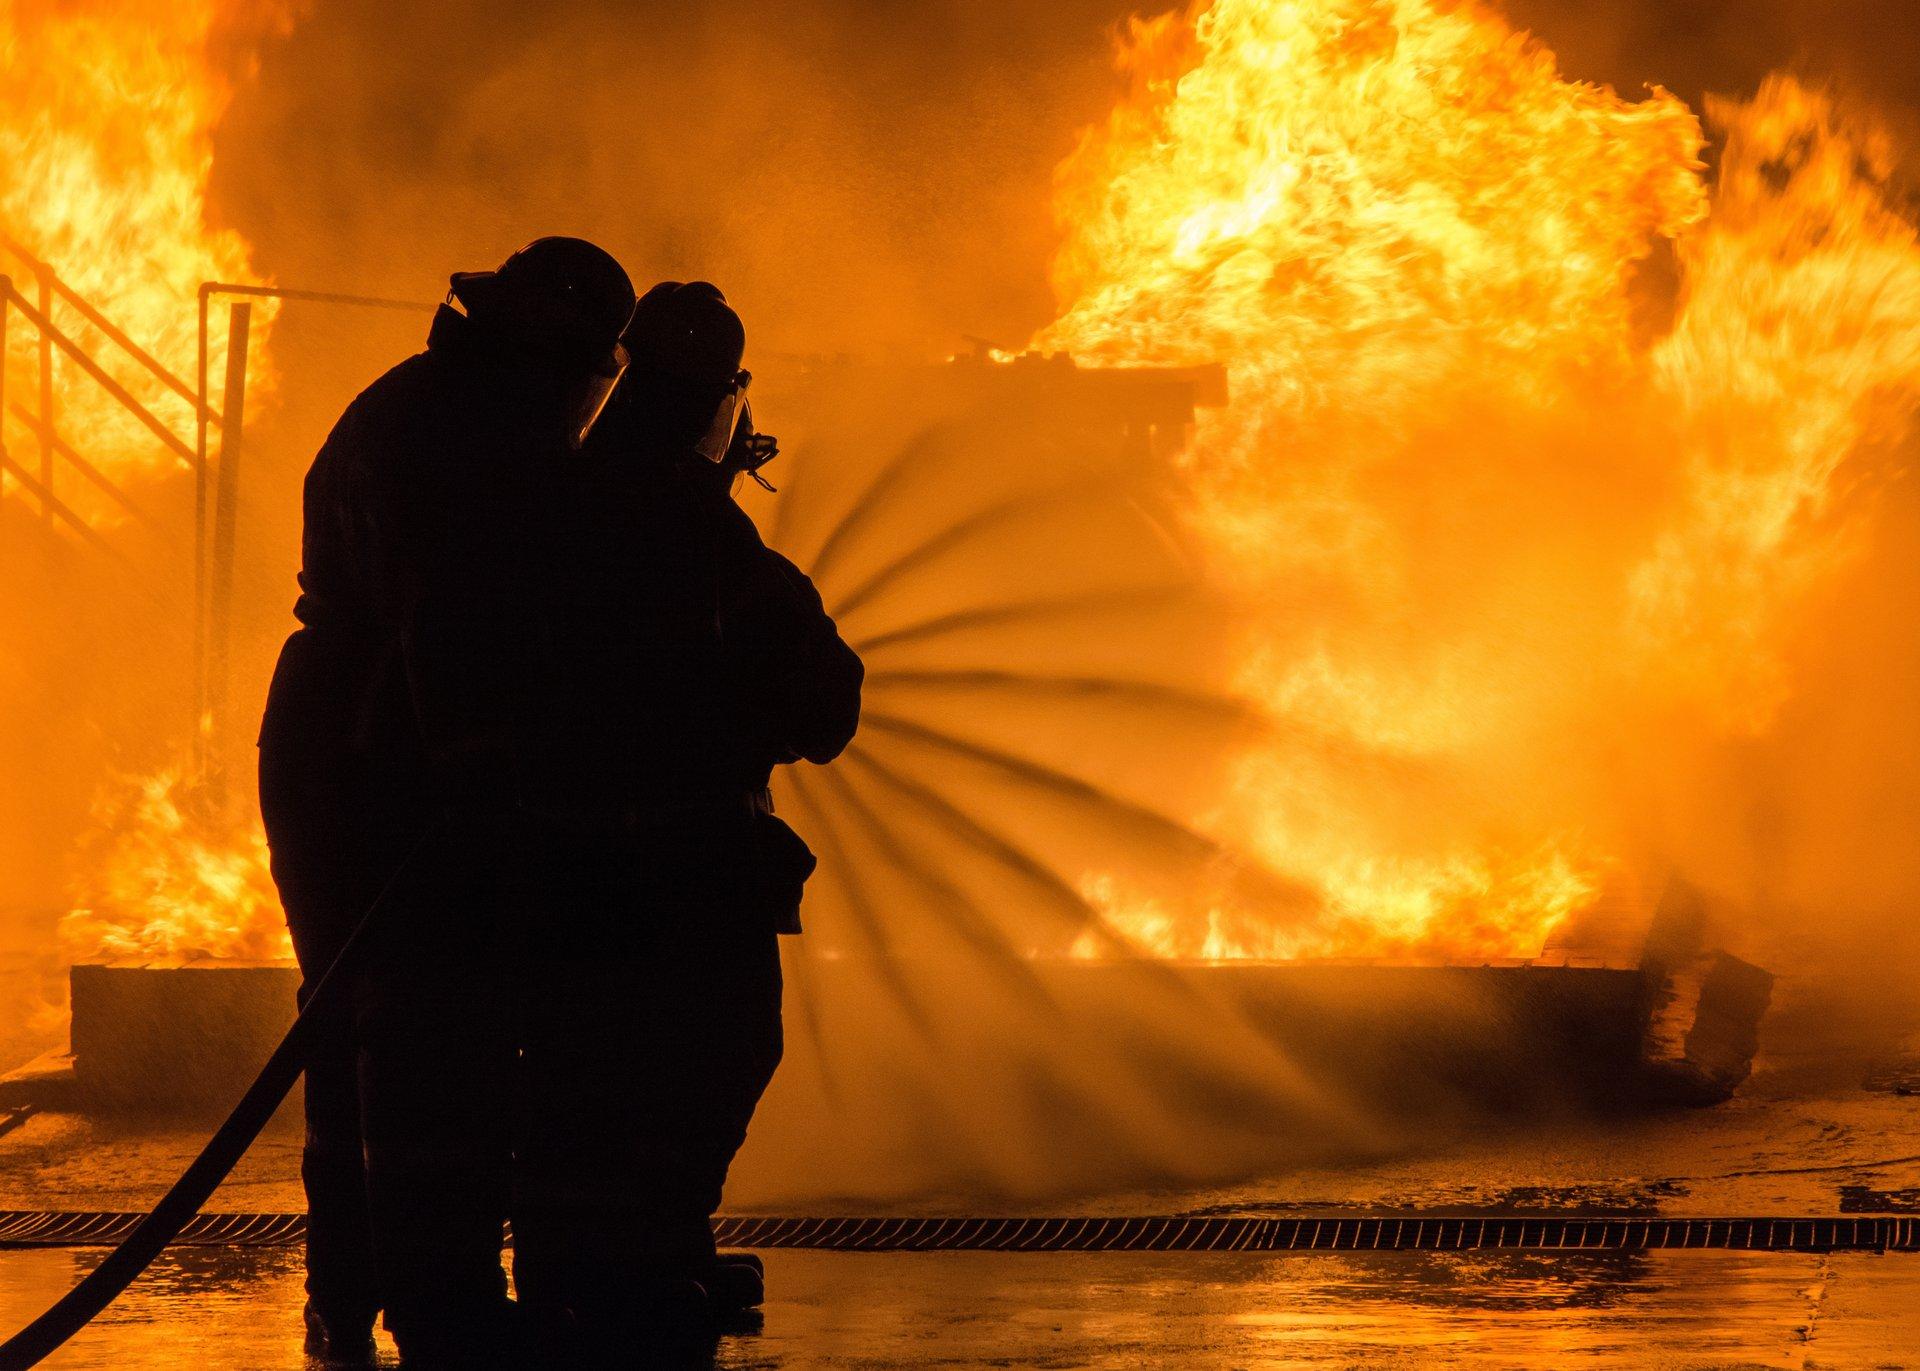 Firefighters extinguishing blaze